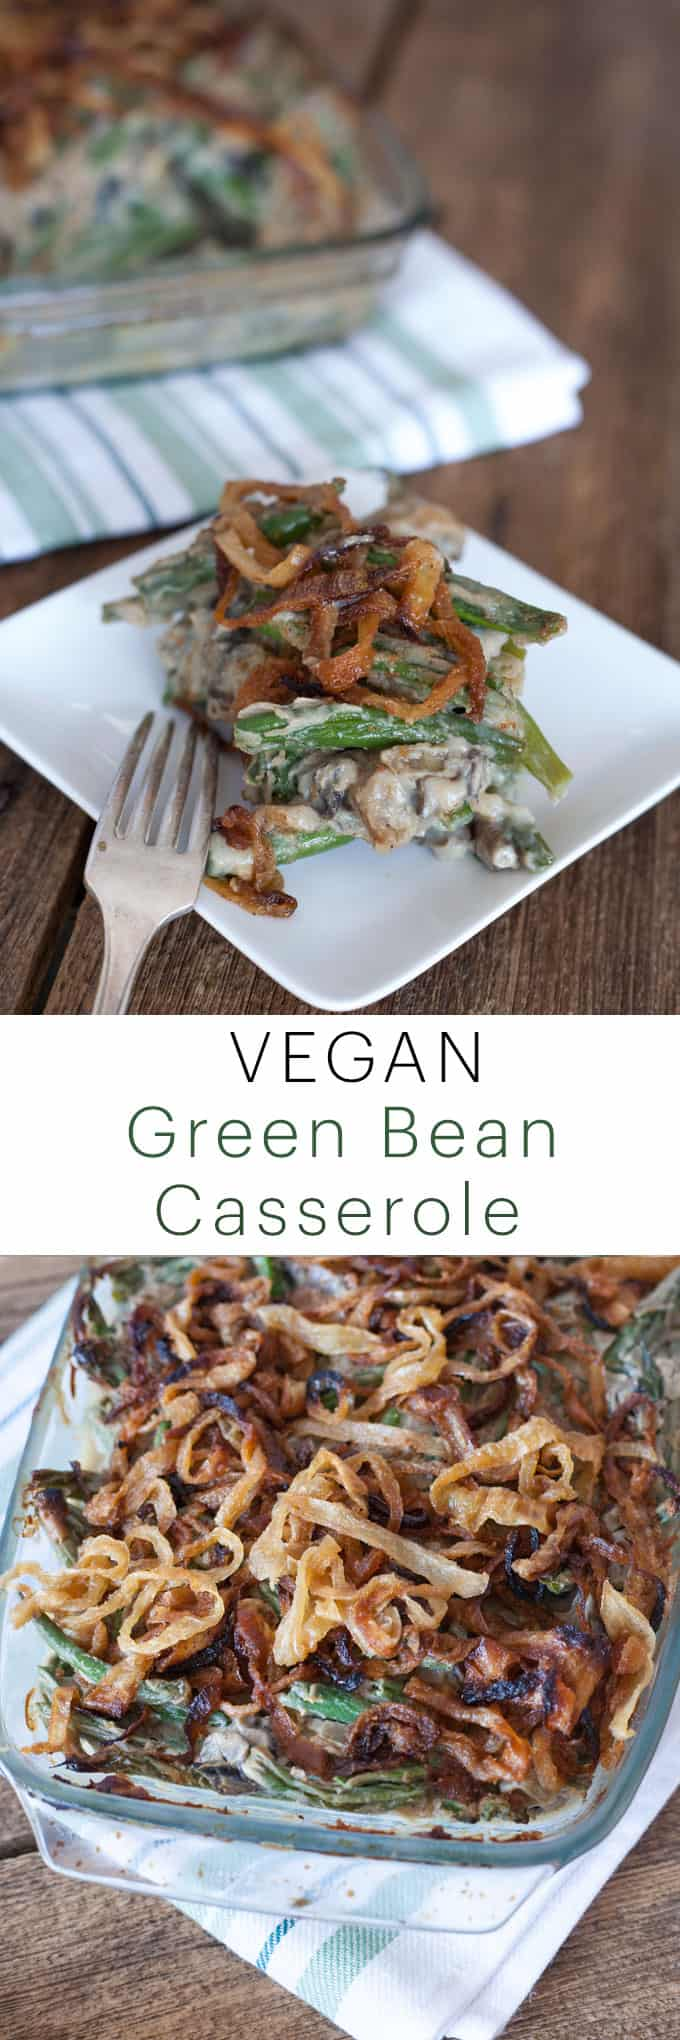 Gluten Free Green Bean Casserole Recipe | Dairy Free